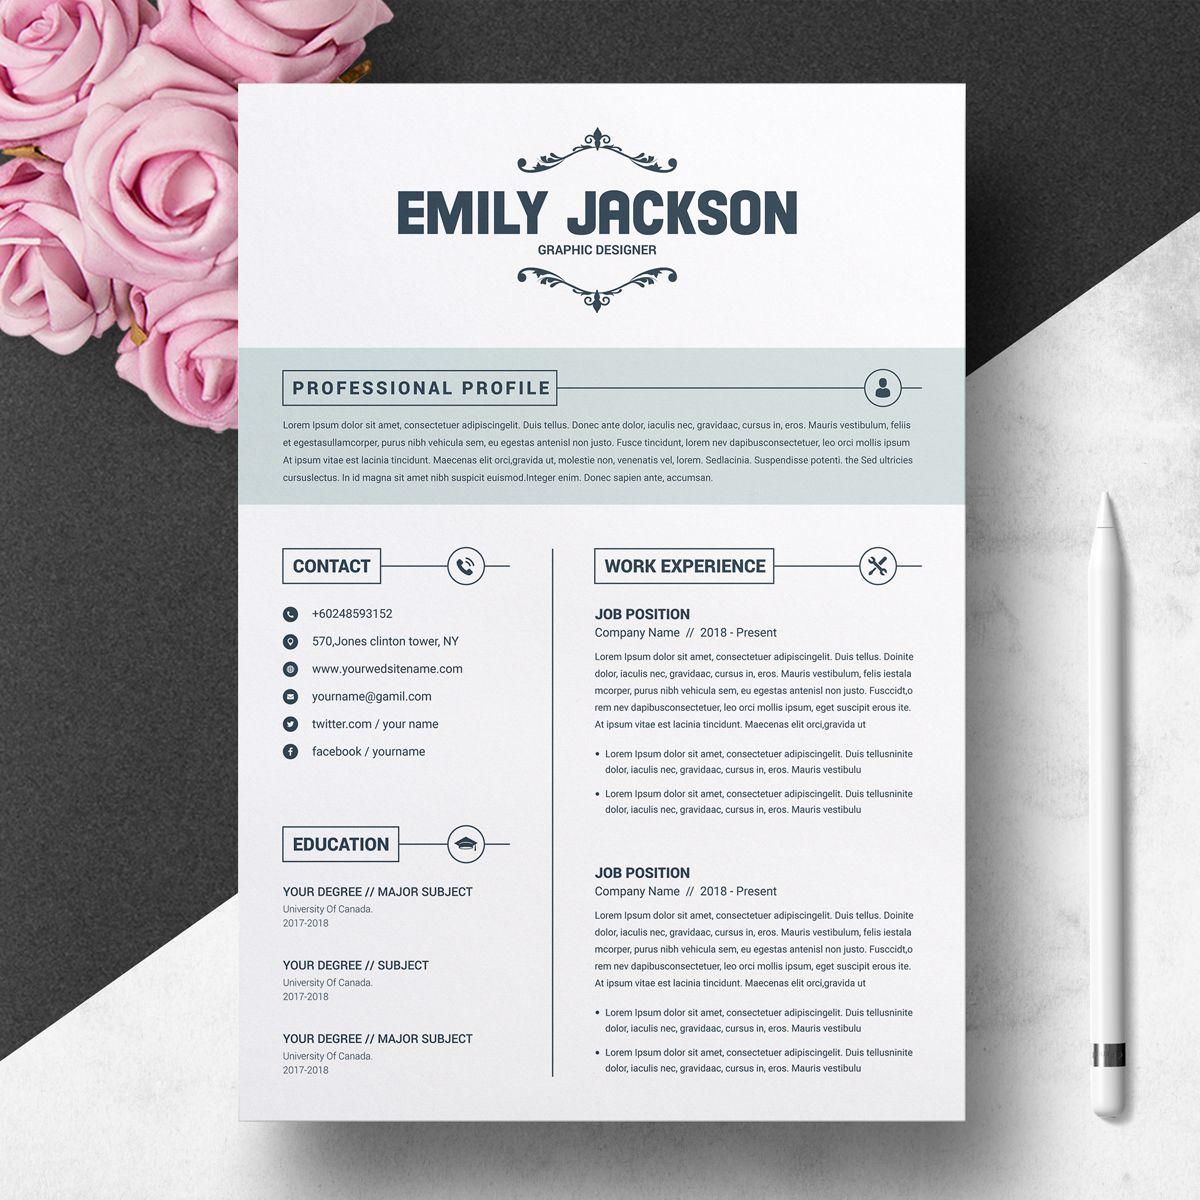 Emily Jackson Resume Template 74376 Cv template, Resume